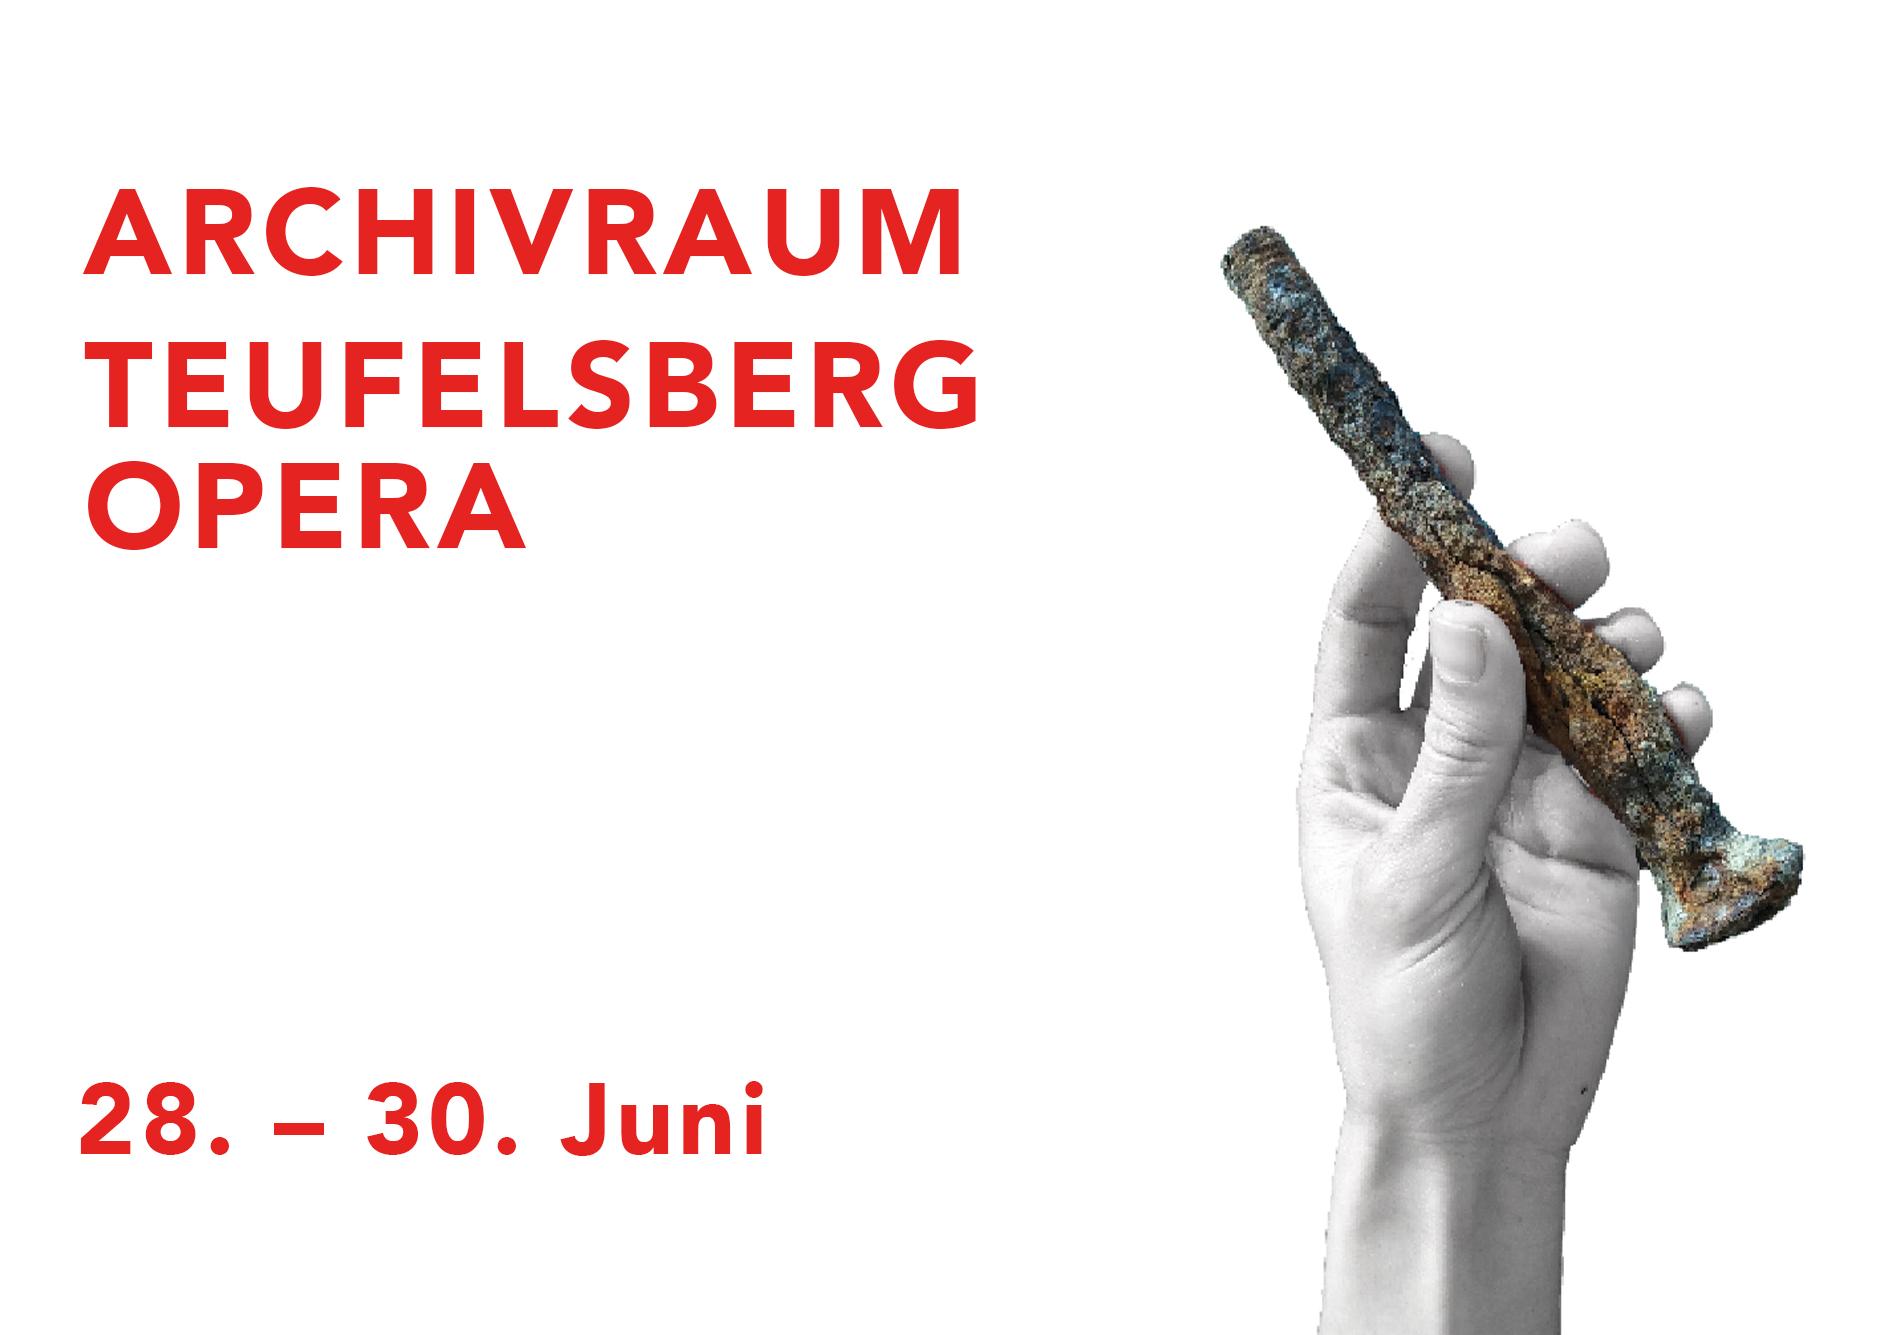 ARCHIVRAUM TEUFELSBERG OPERA